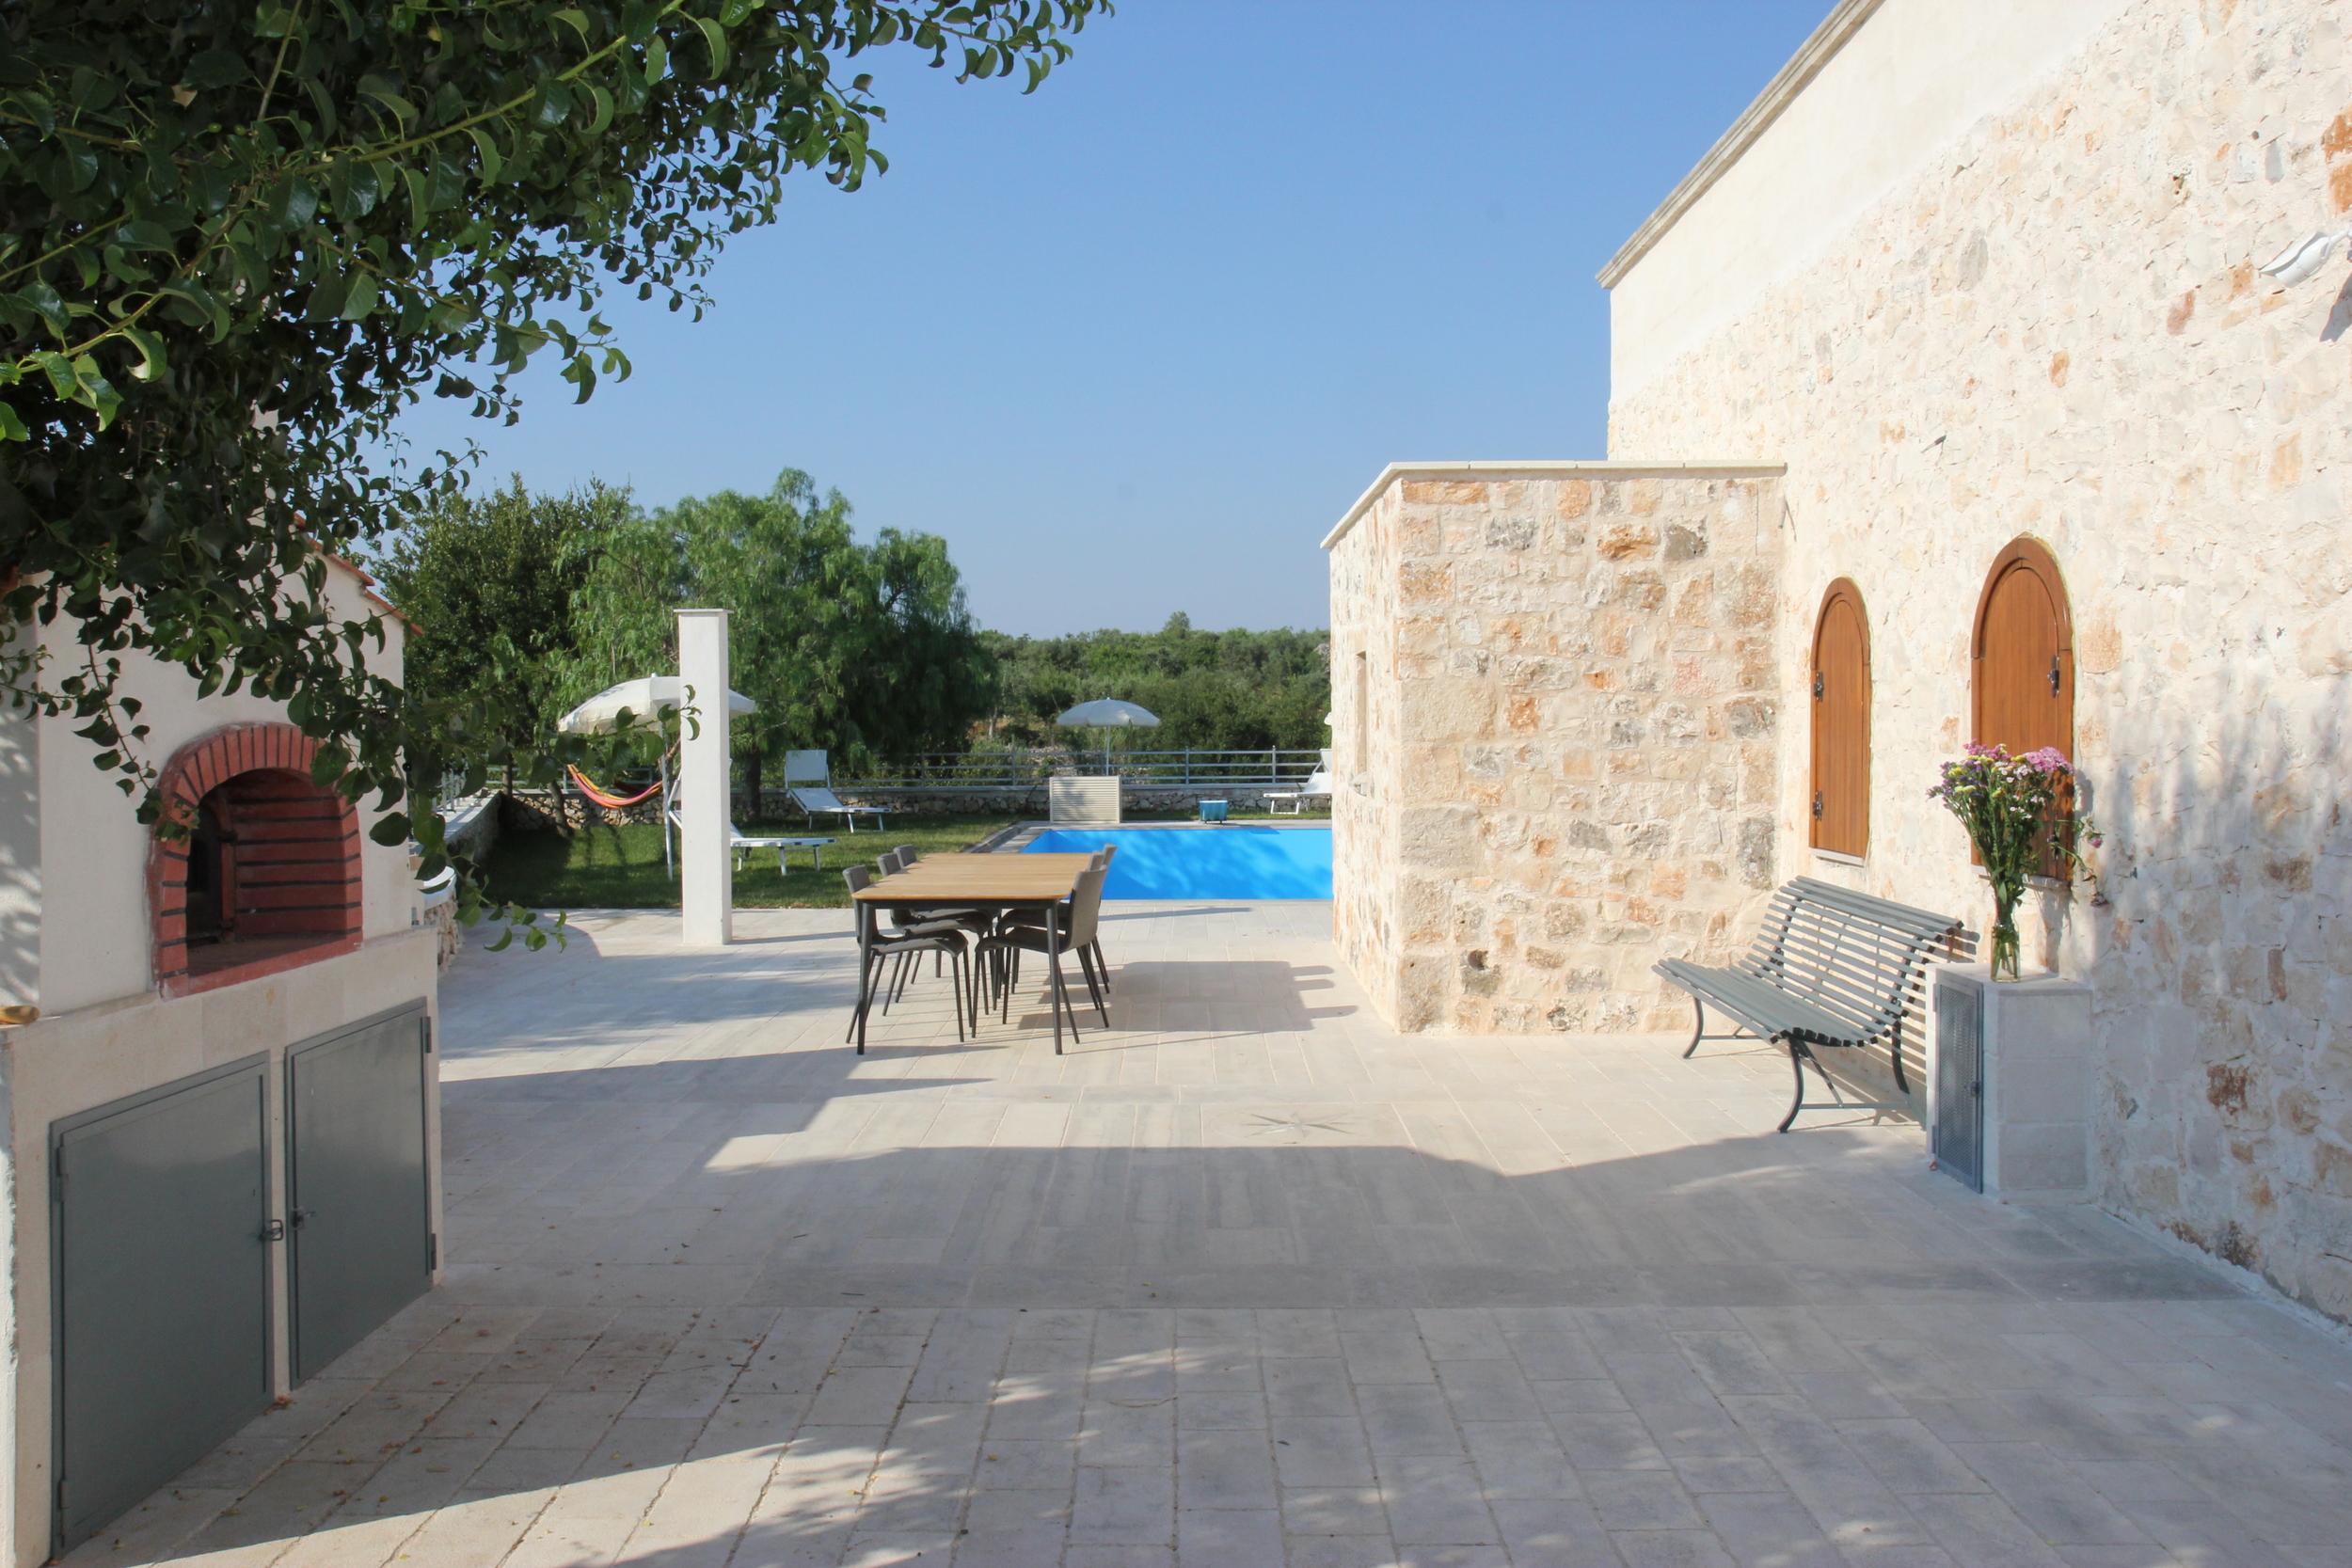 Puglia 2015-06 240.JPG